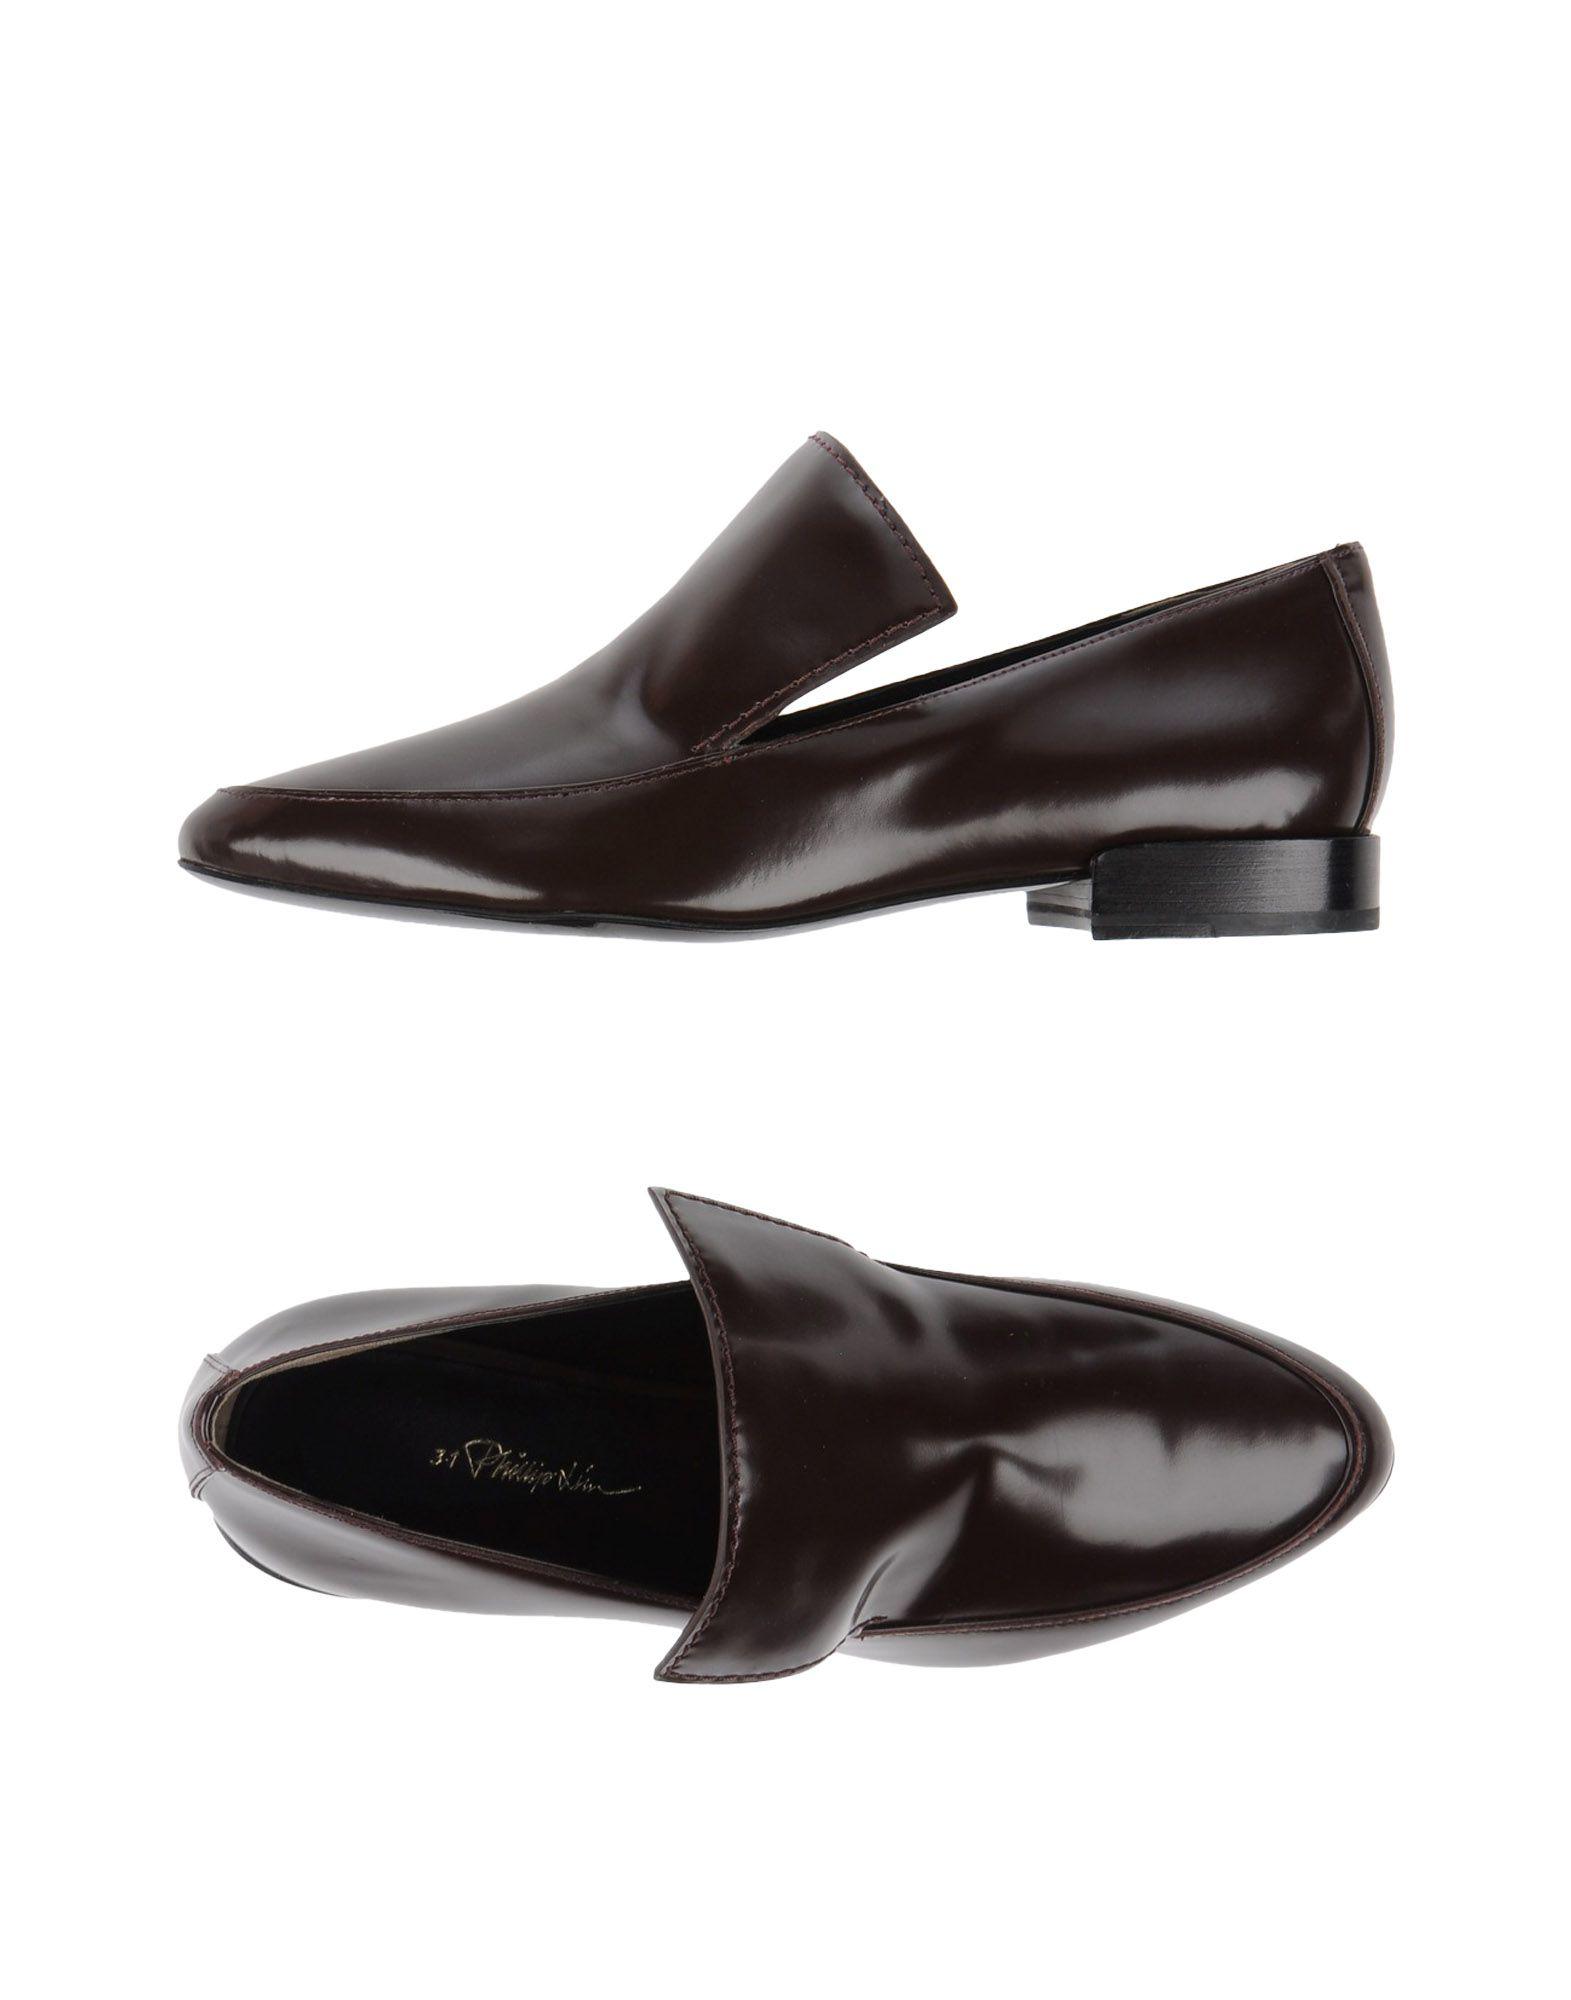 Rabatt Schuhe 3.1 Phillip Lim Mokassins Damen  11199449HN